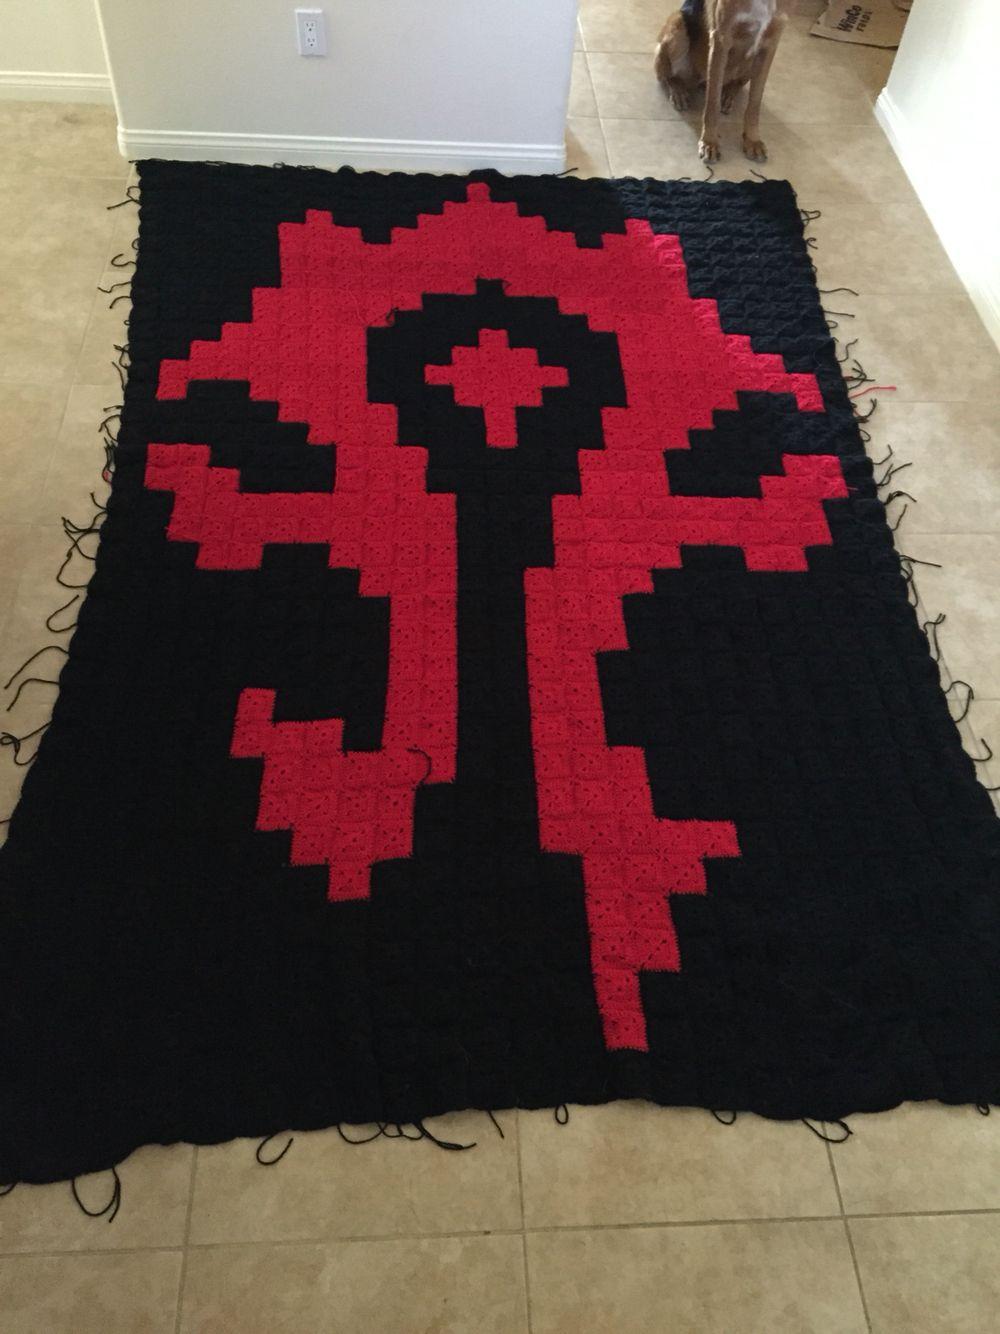 982b0ccd11f World of Warcraft horde symbol crochet blanket.  Www.facebook.com nerdyknits2013